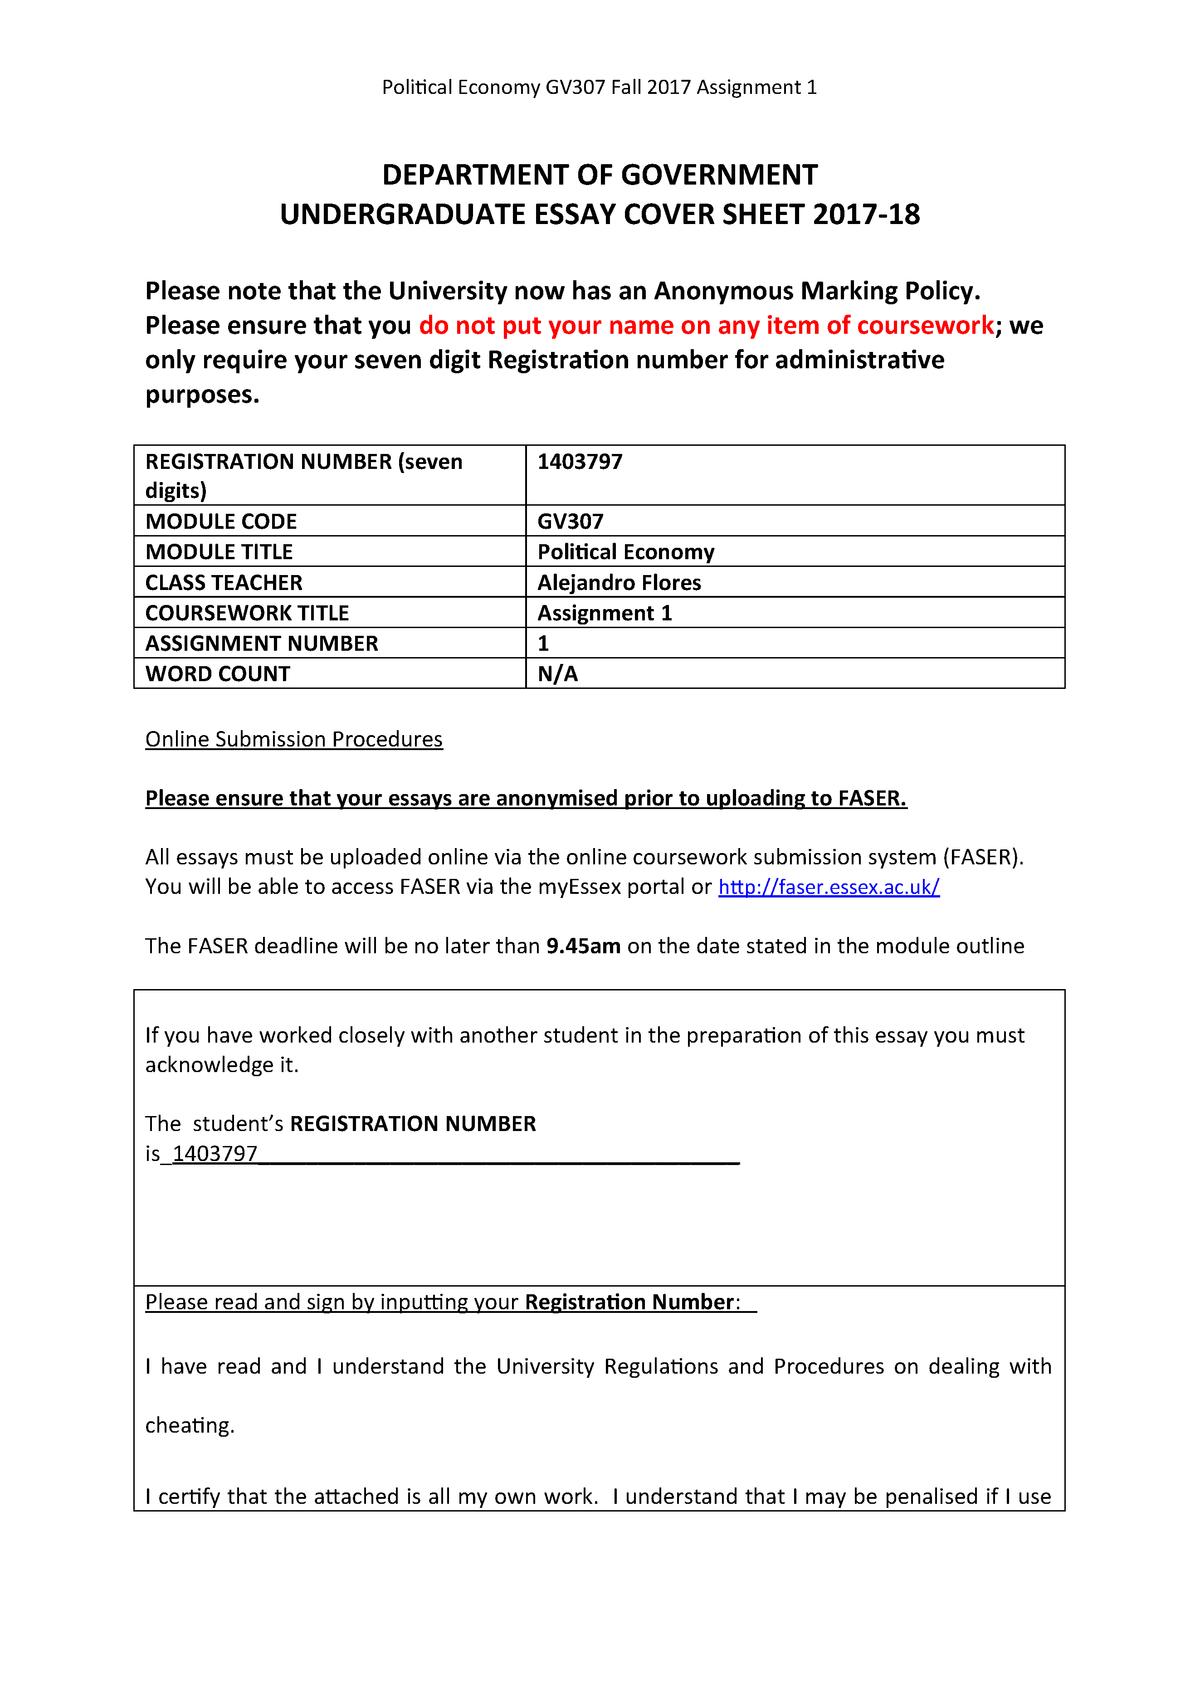 university of essex education